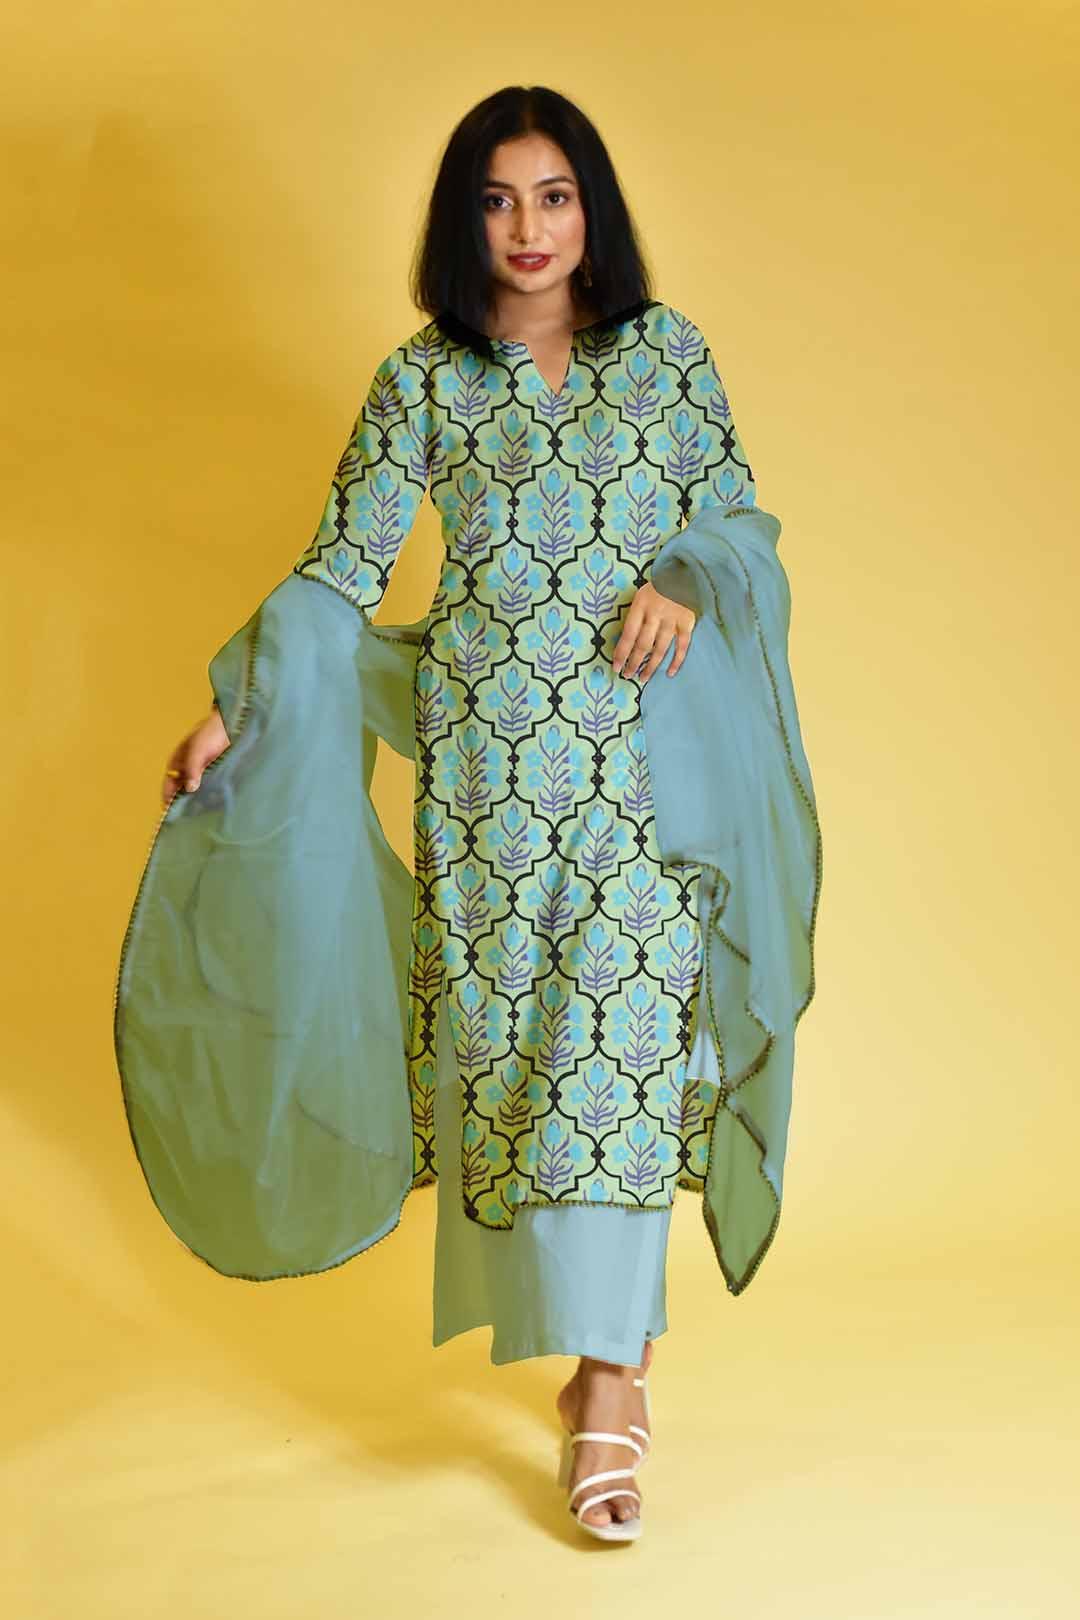 Cotton Palazzo Suit – Charming Subtlety